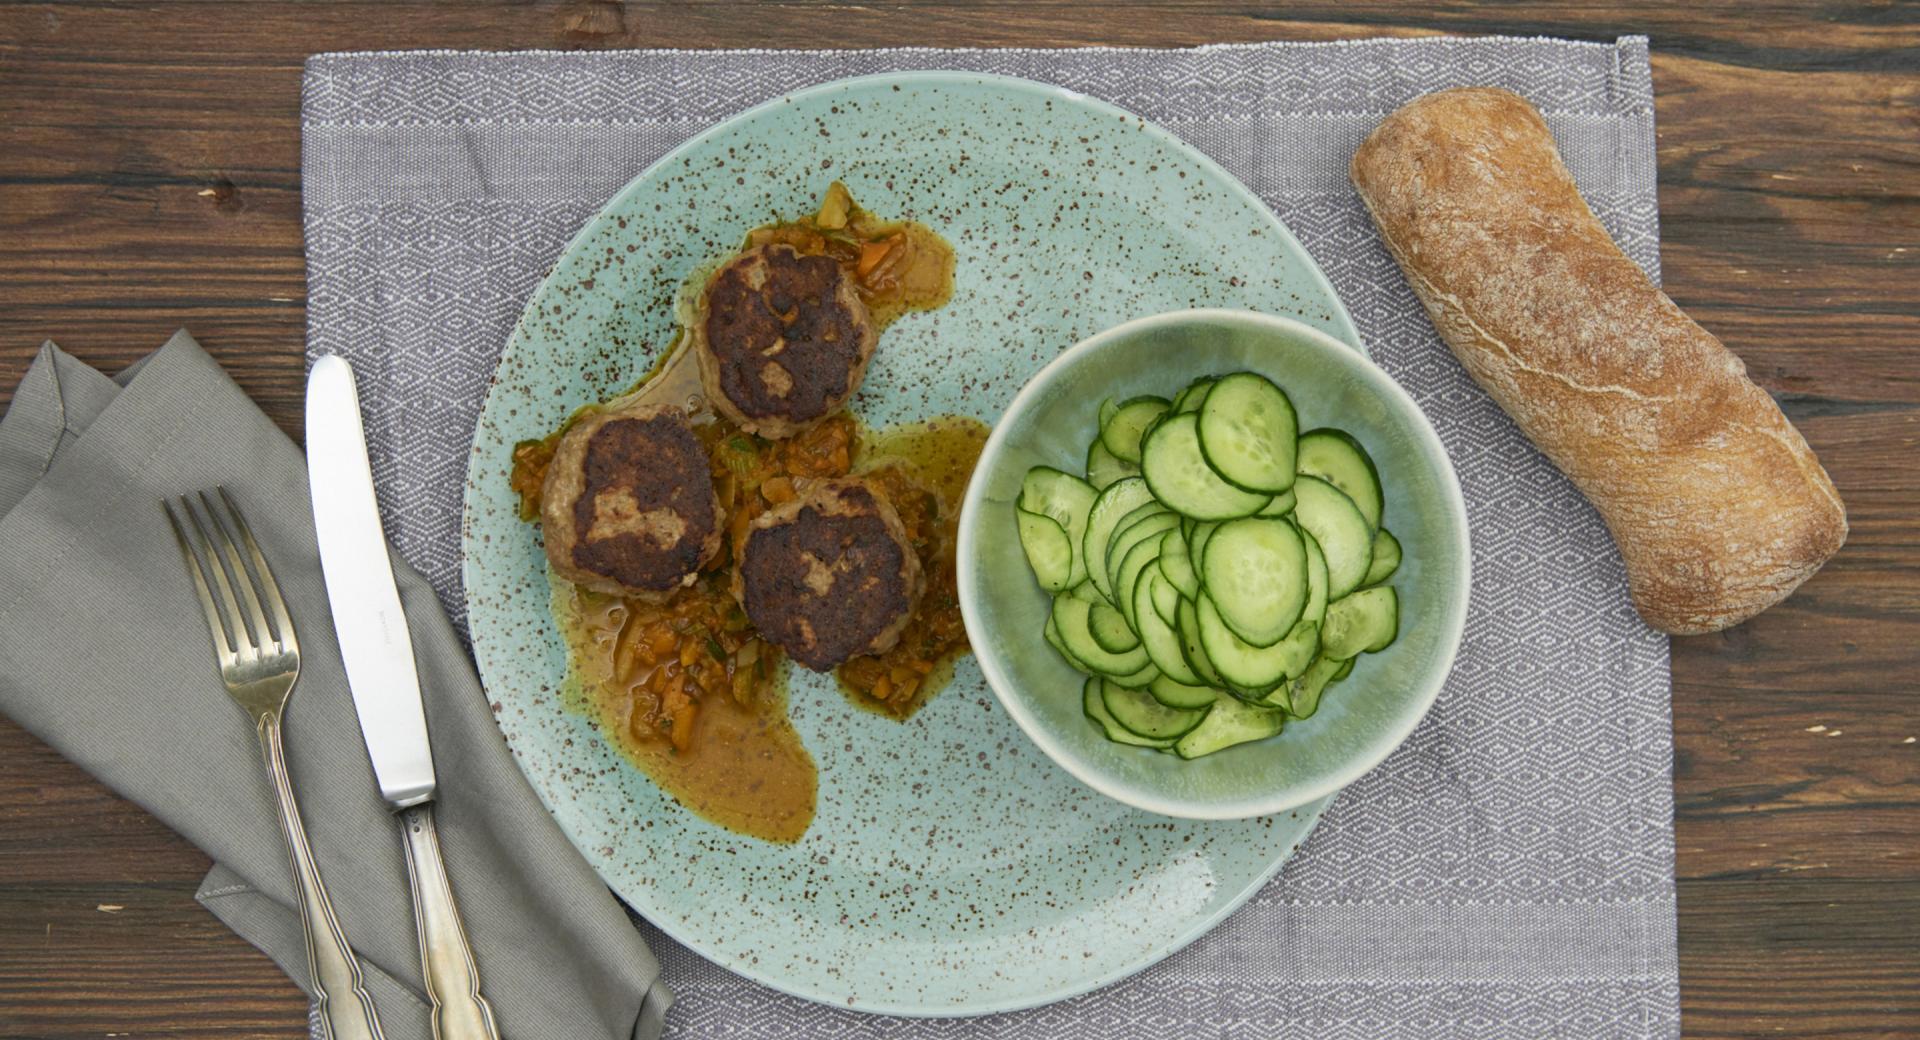 Danish meatballs with cucumber salad